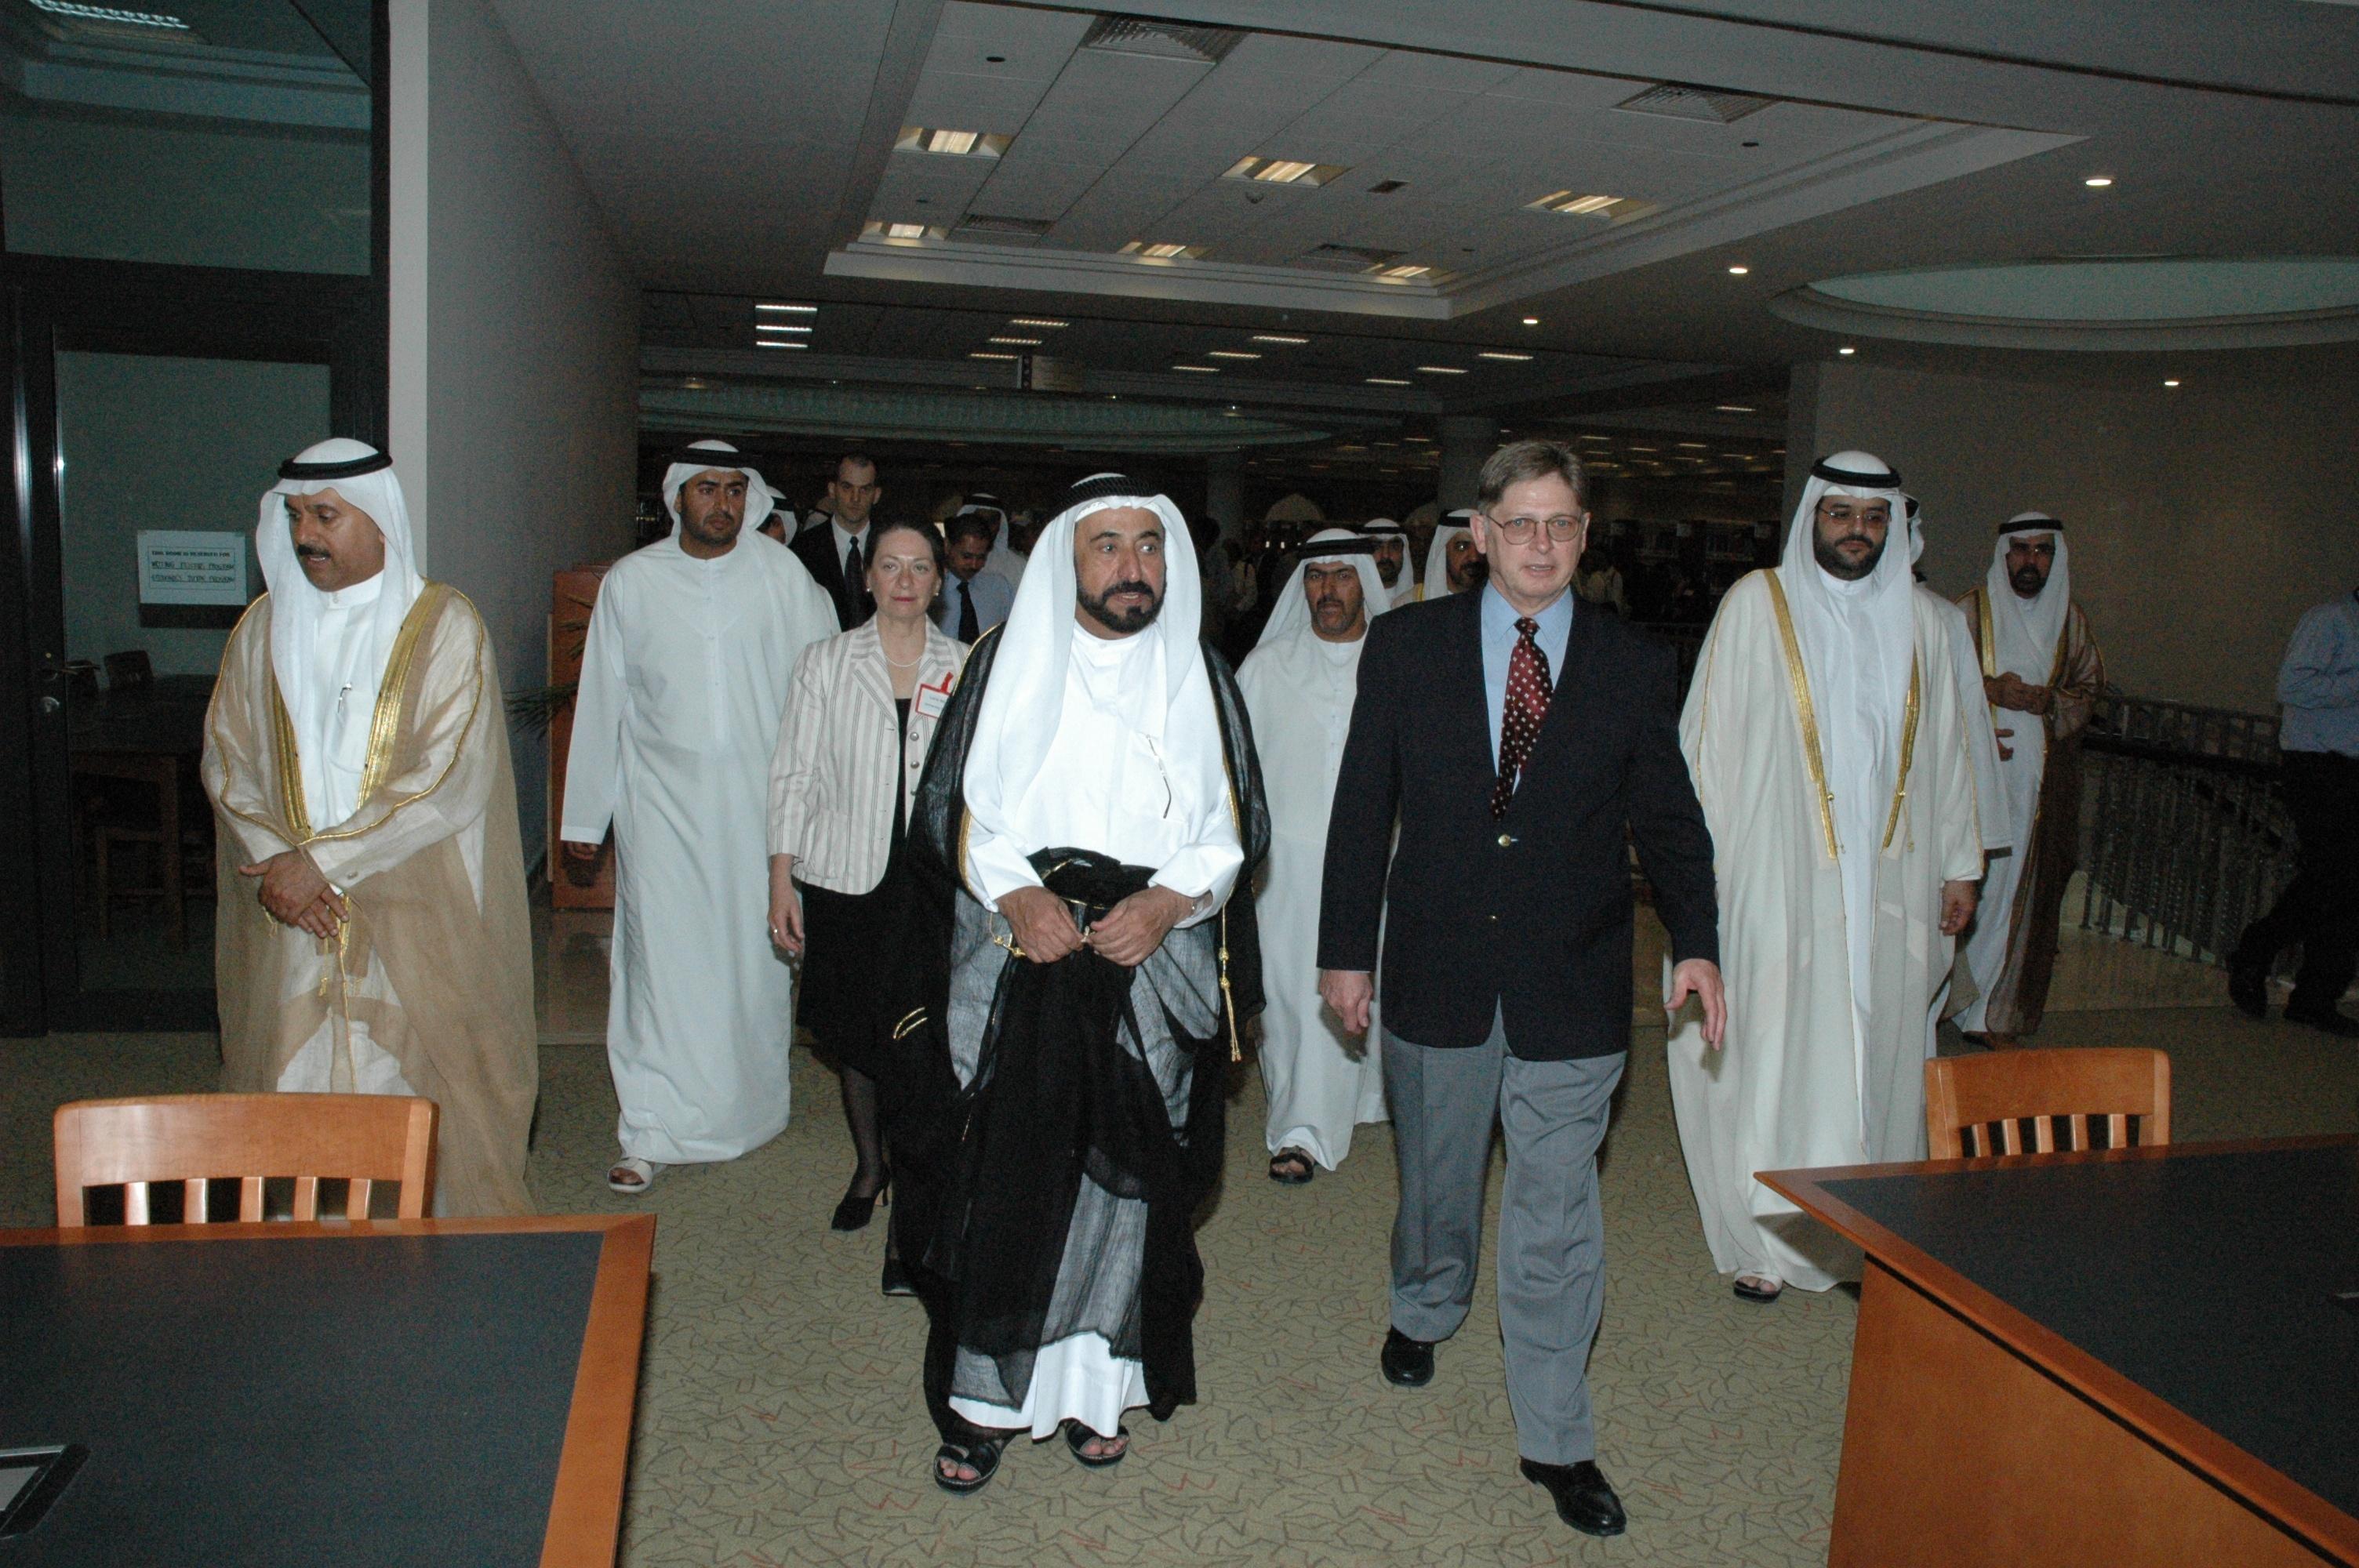 American_University_of_Sharjah_Library_9.jpg